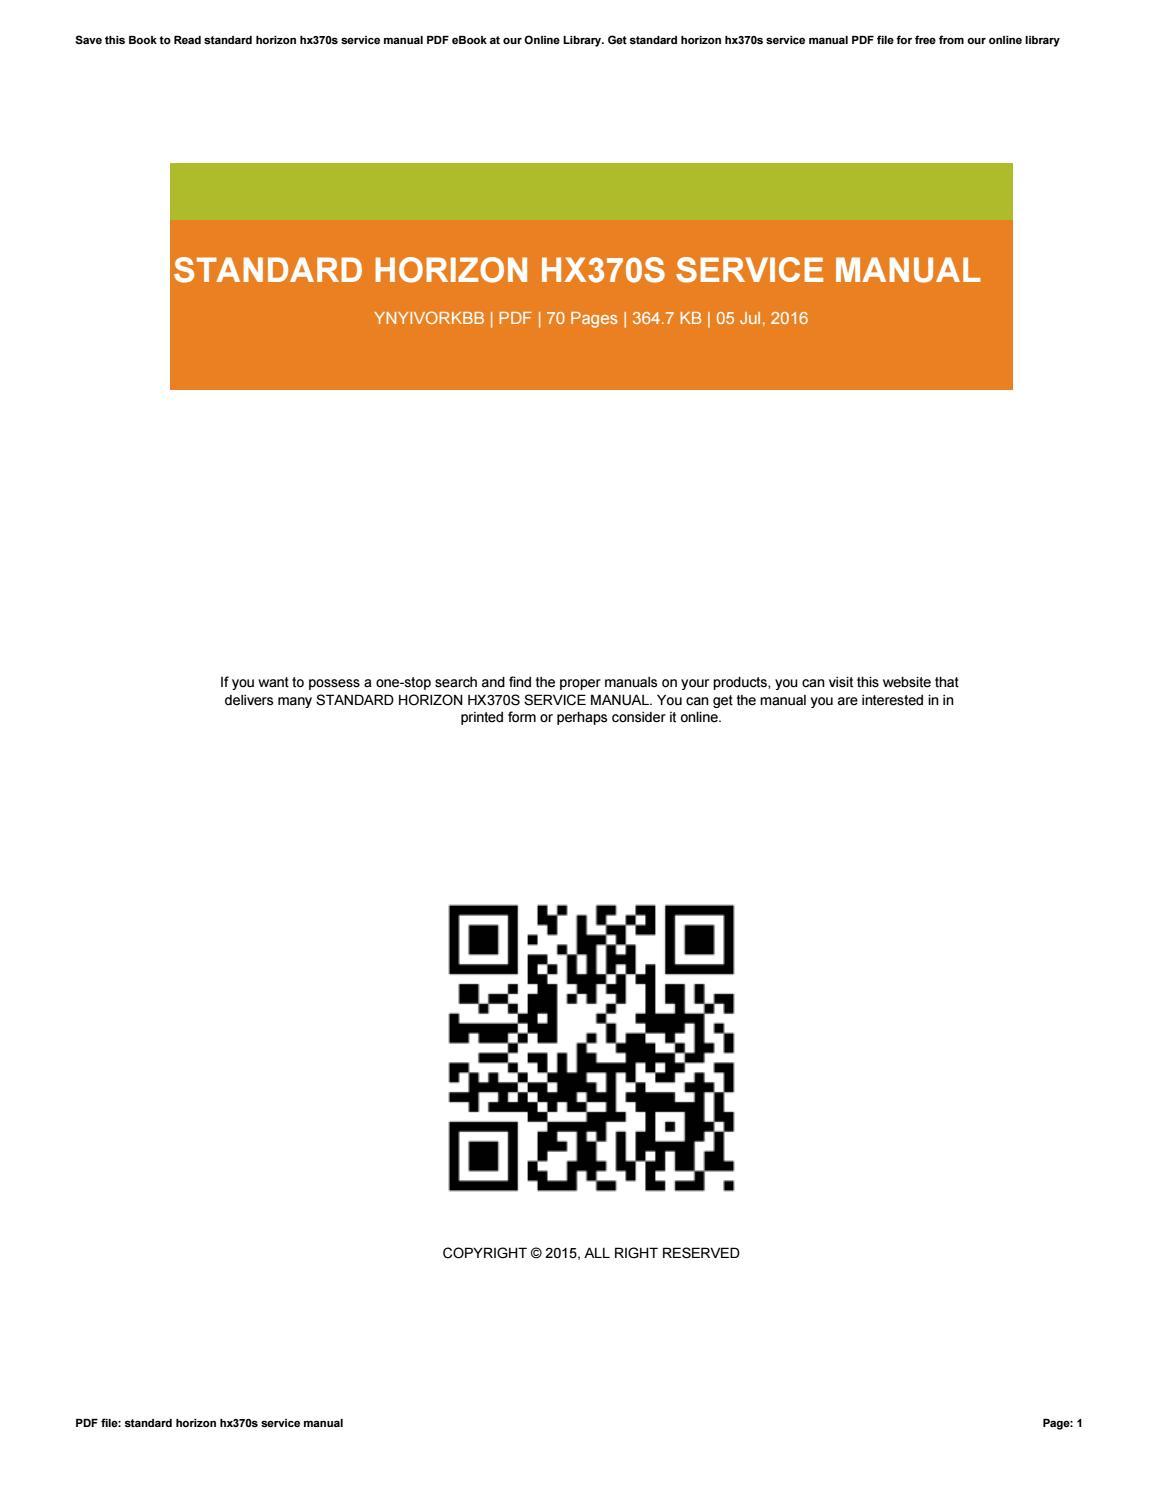 Welcome to standardhorizon. Com.